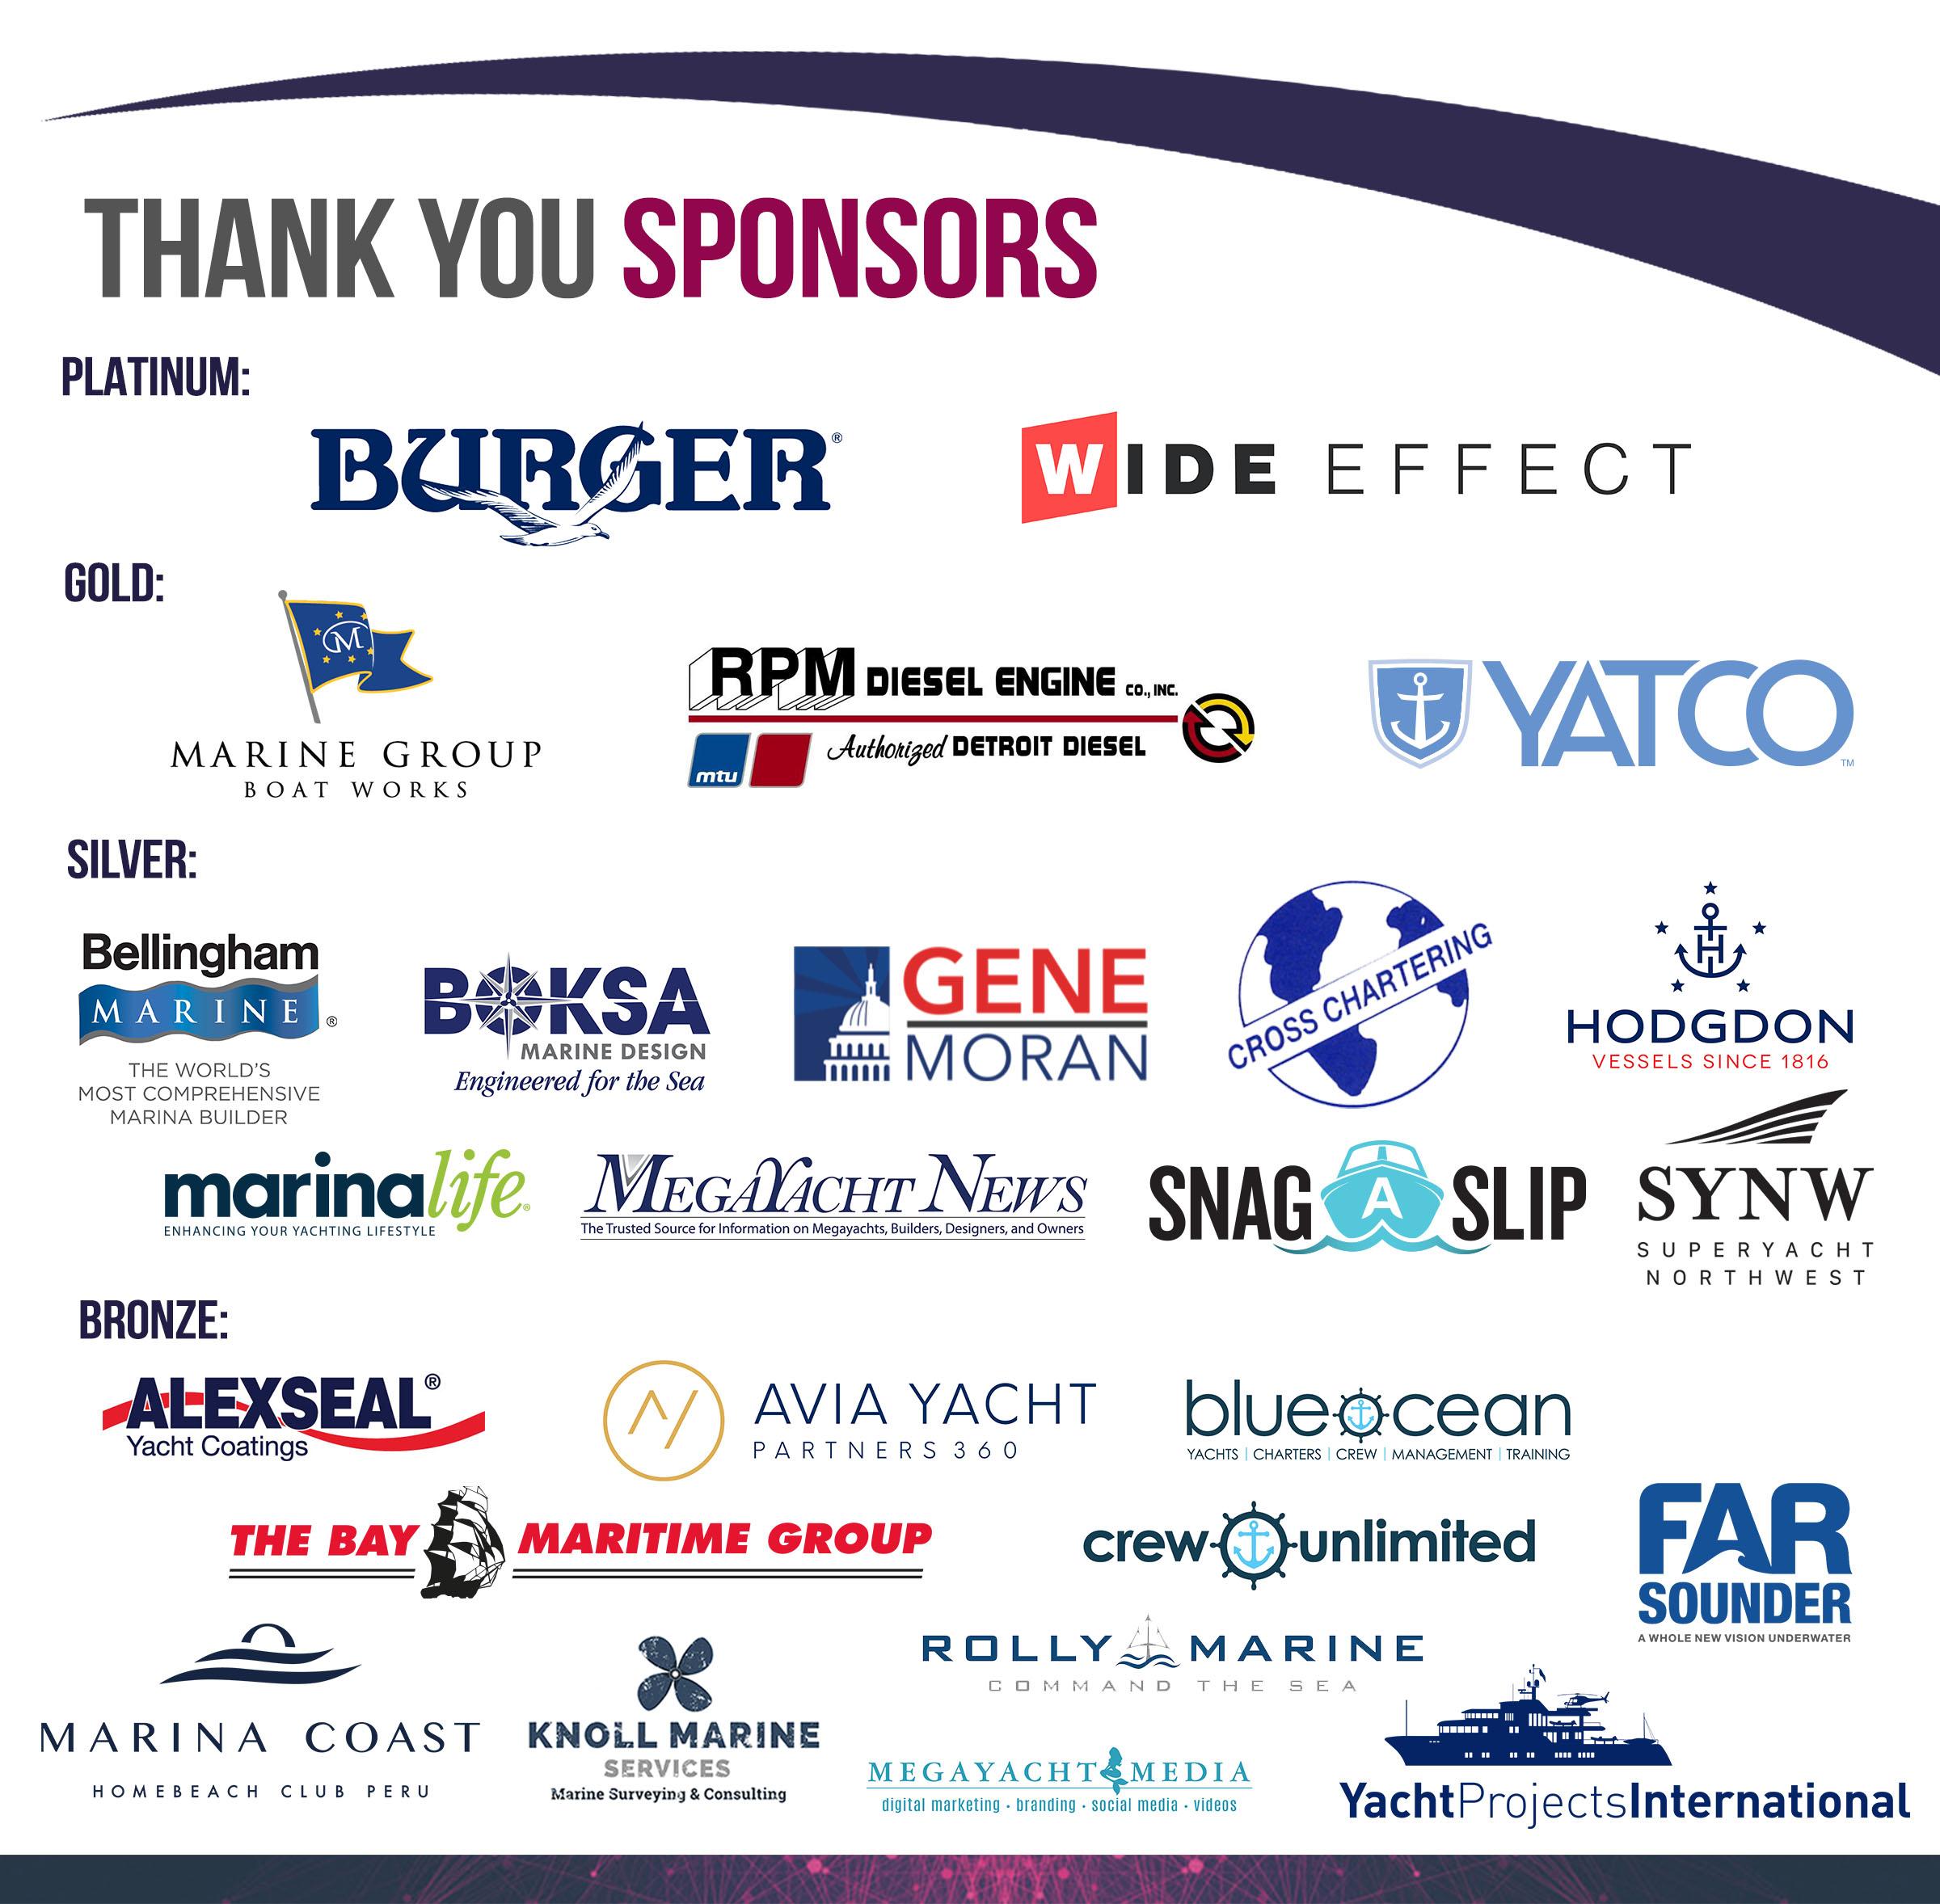 Superyacht Summit Sponsors